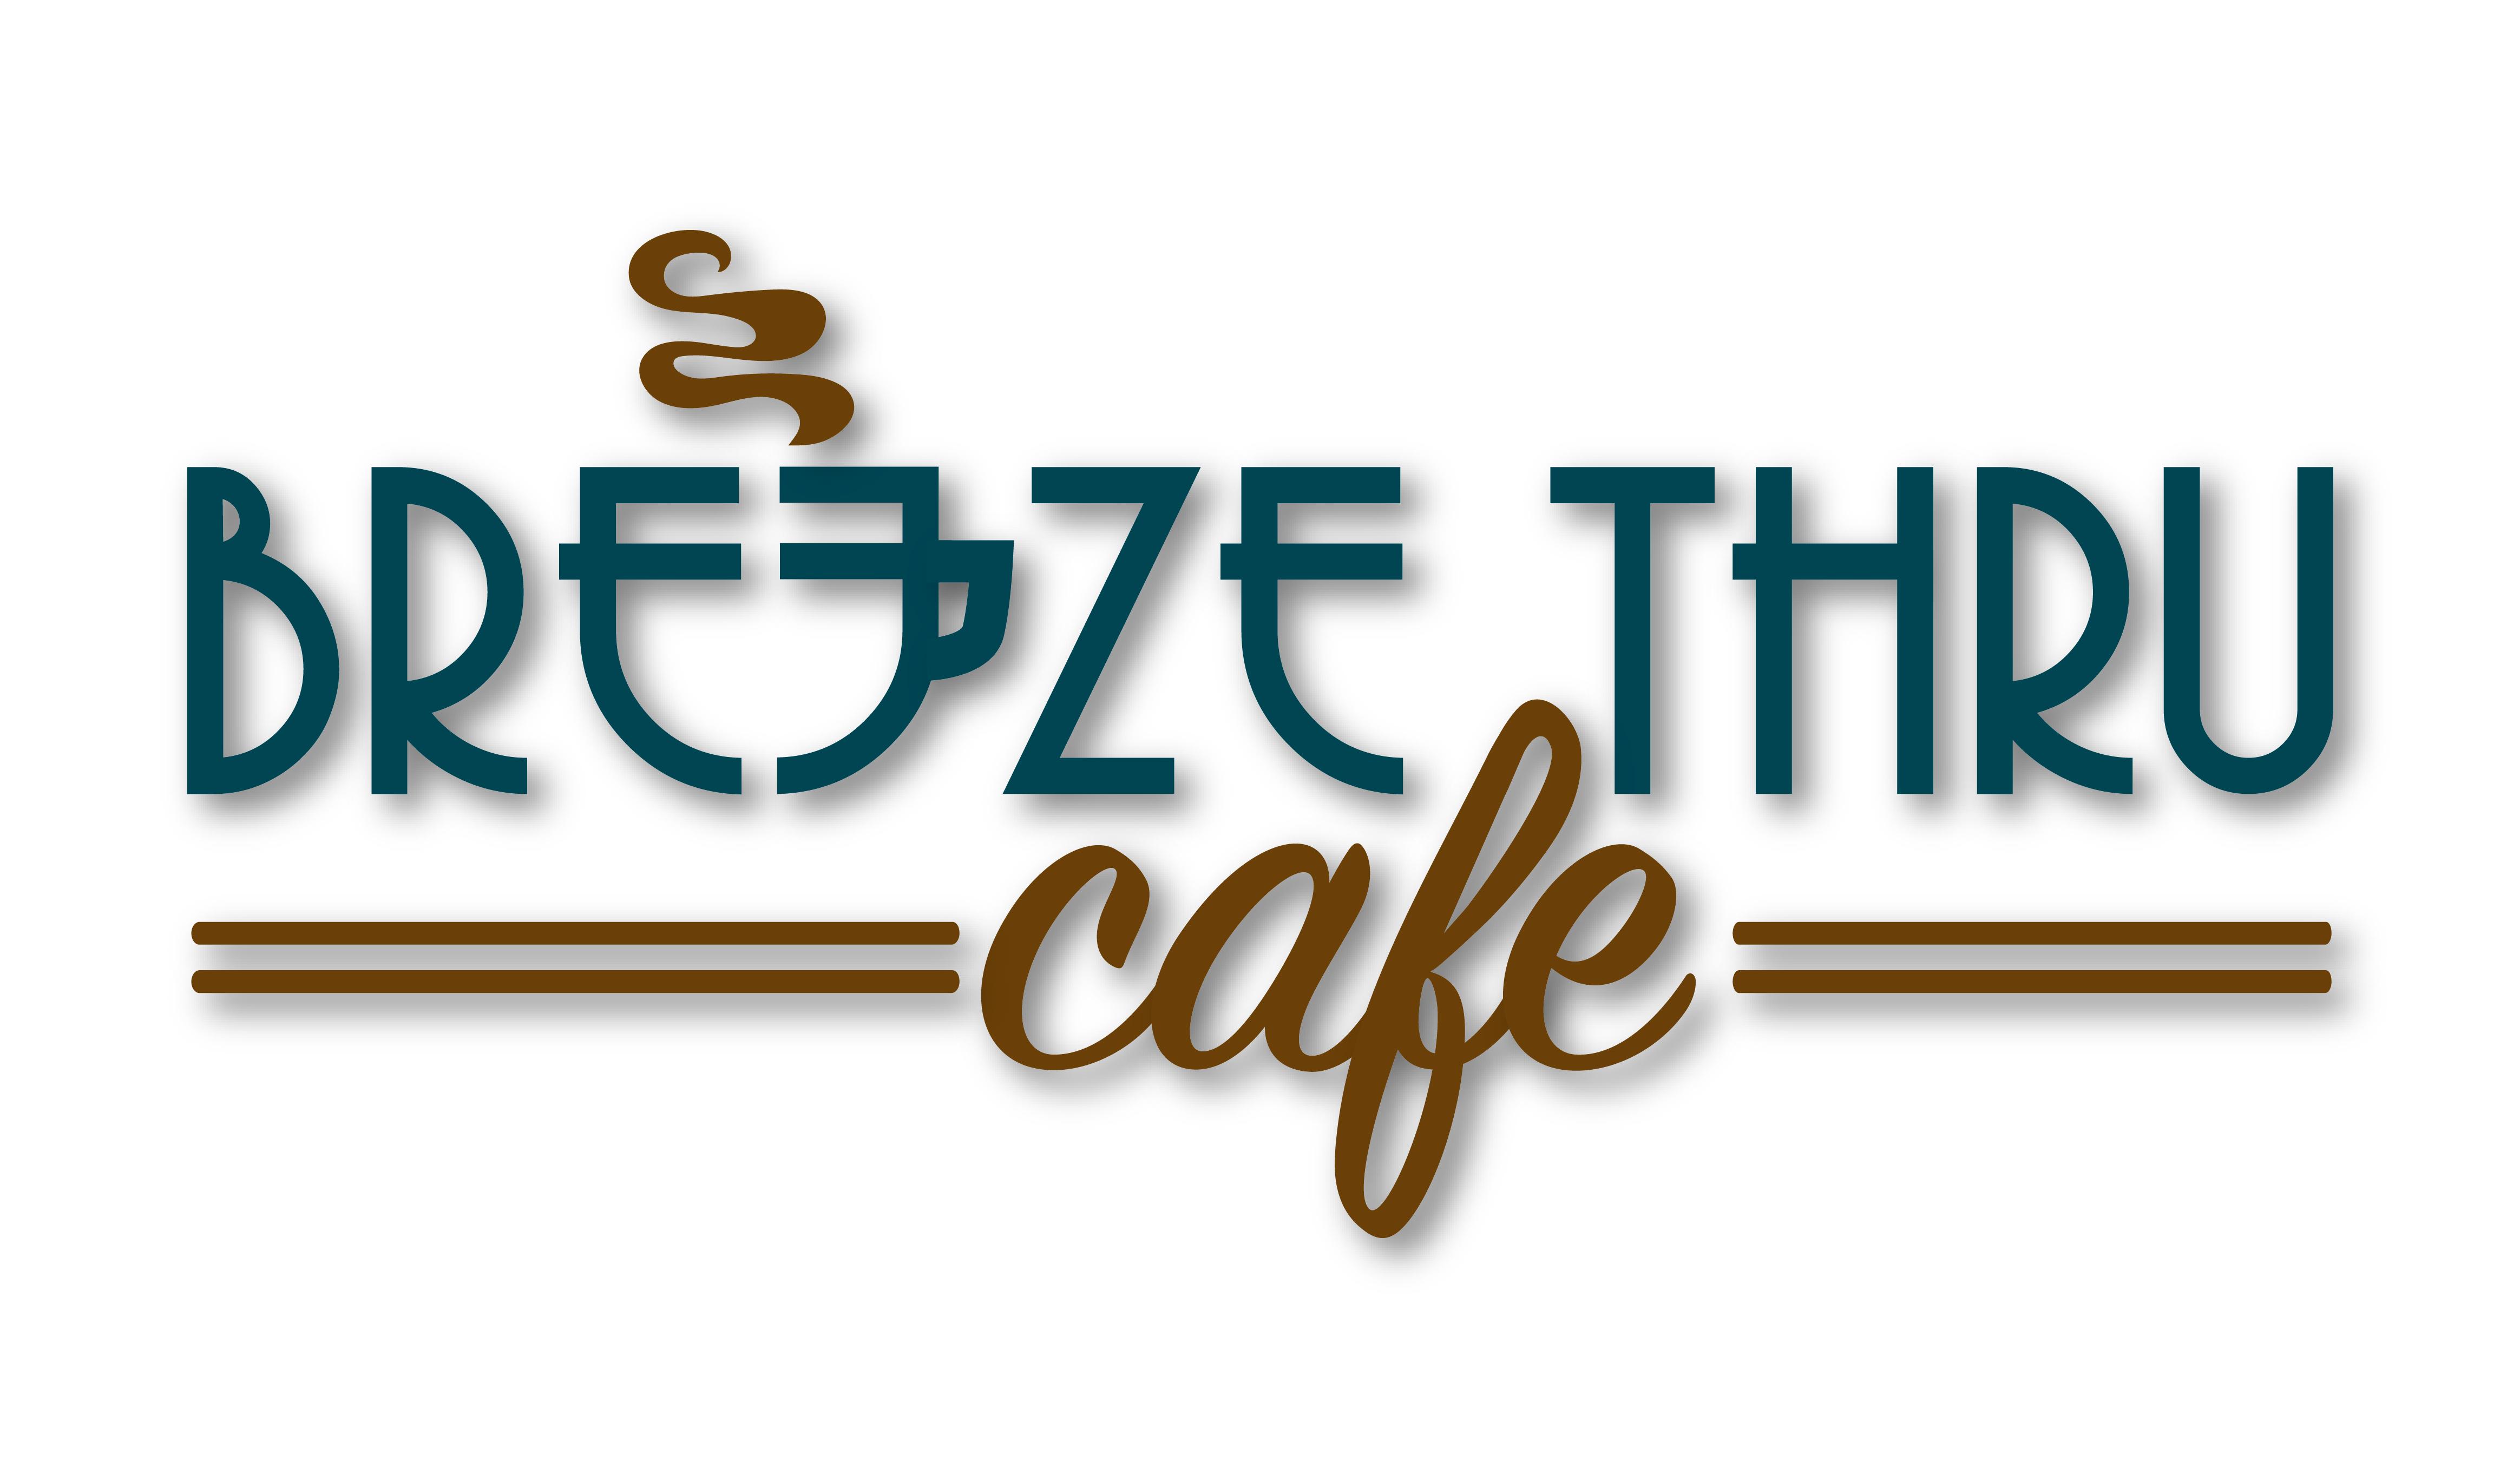 Breezethru logo-01